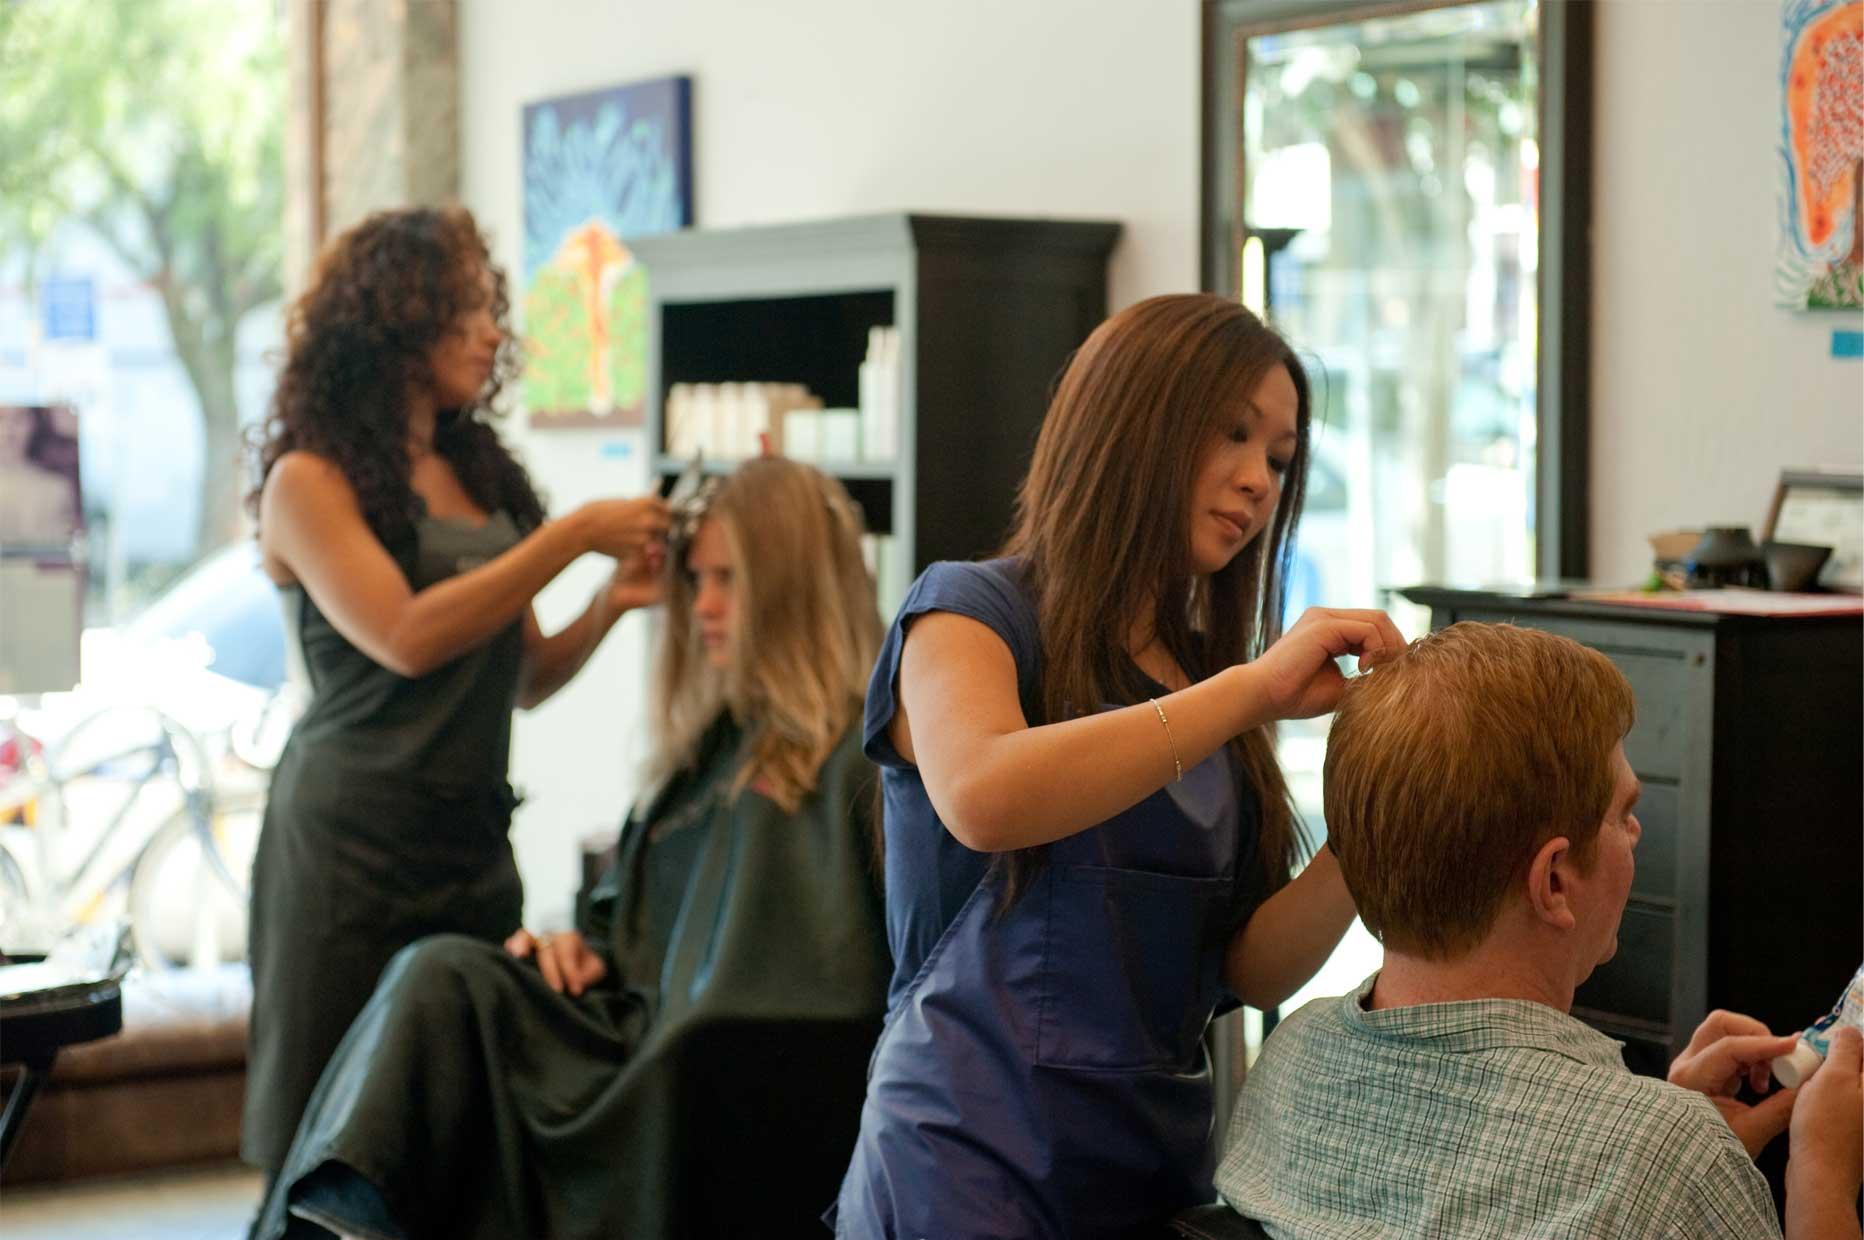 rome hair school courses michael boychuck online hair academy rome hair artist courses